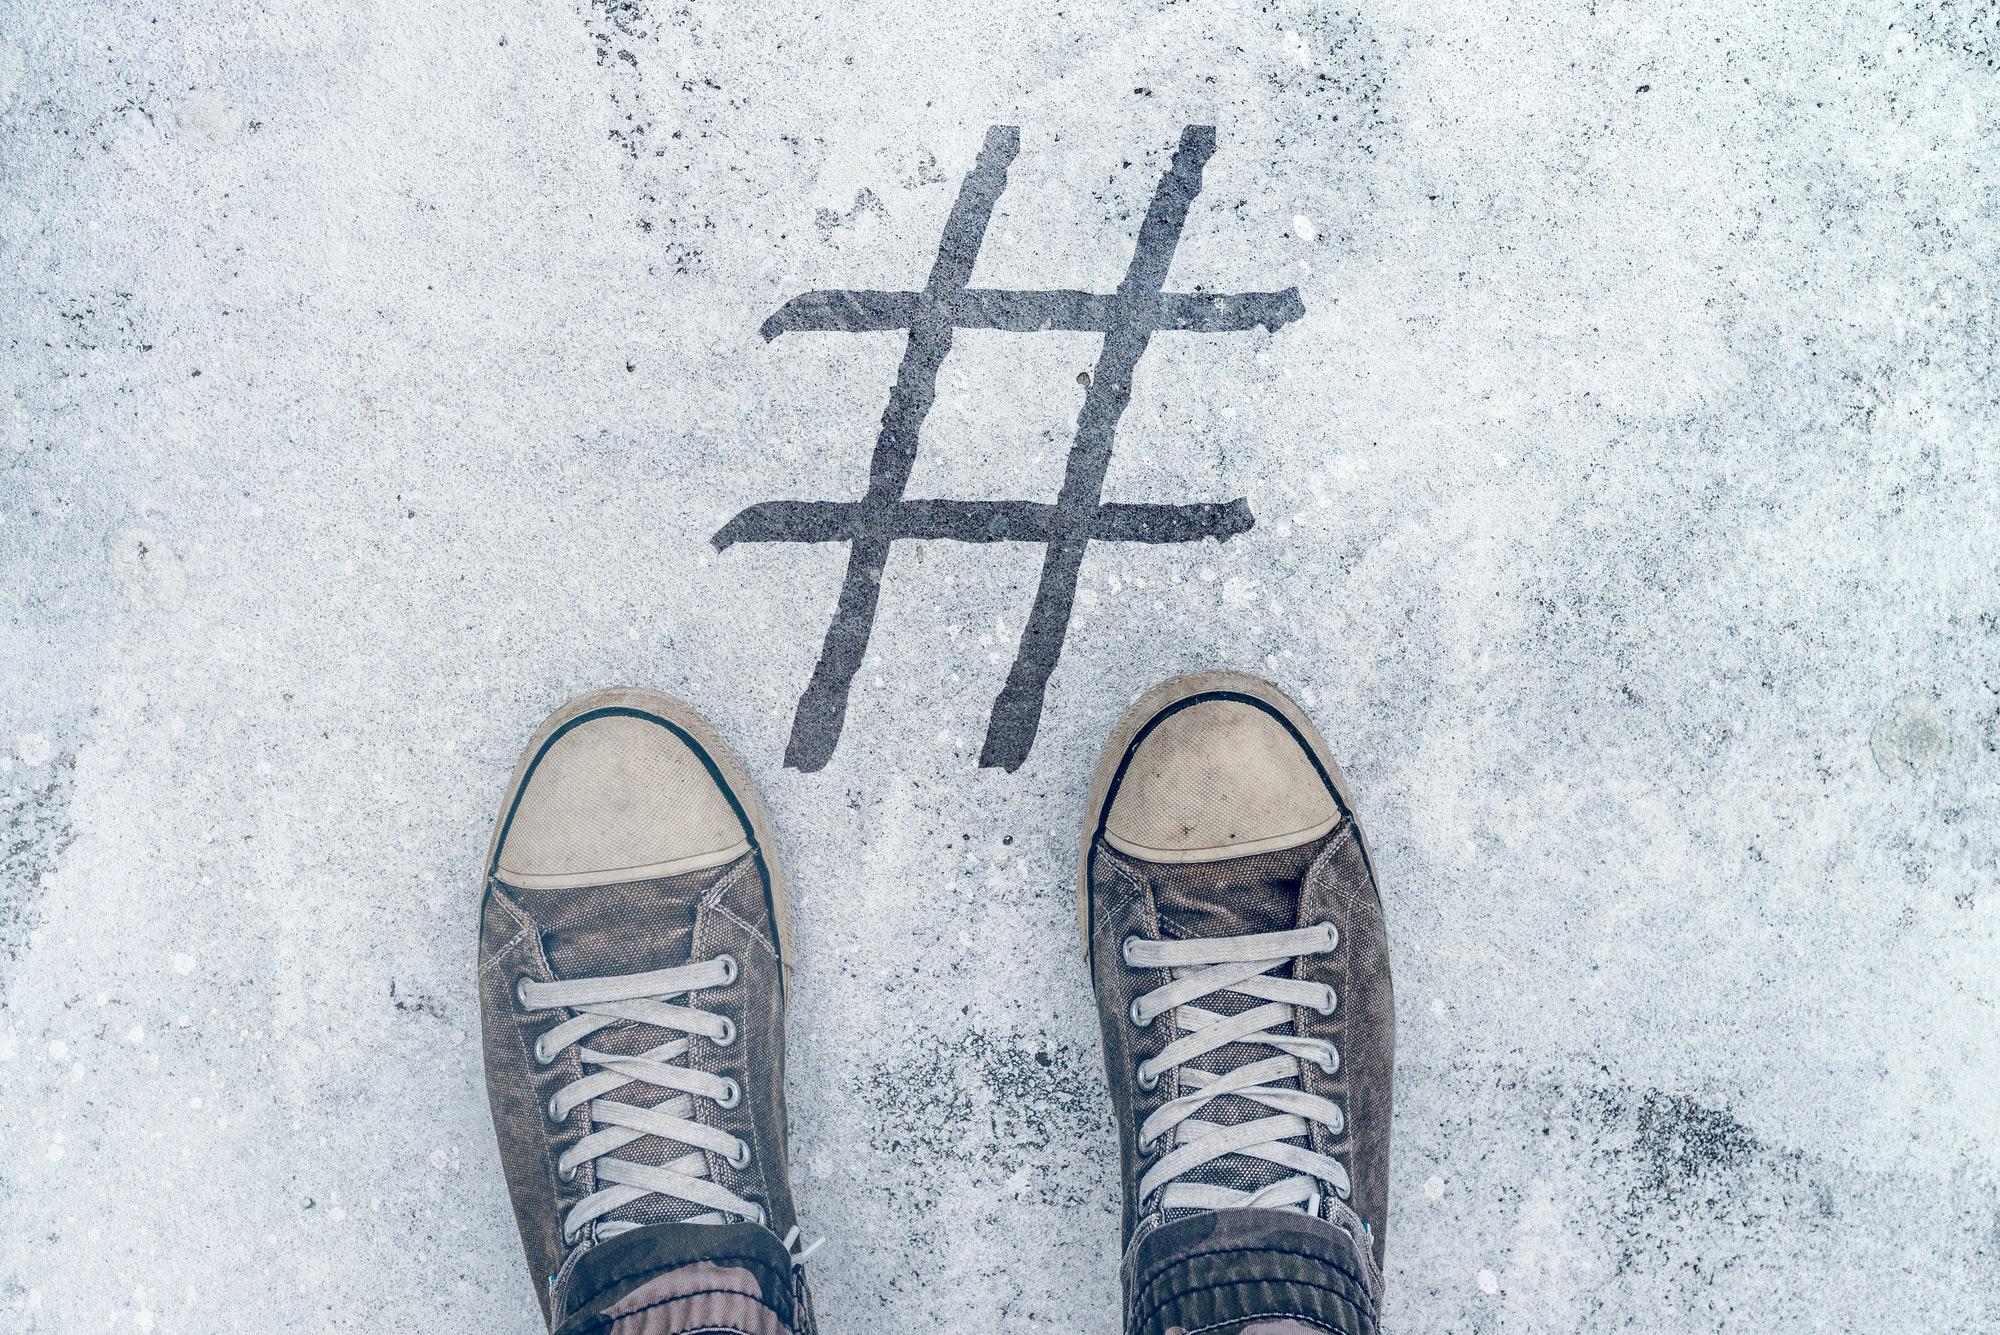 Hashtags prohibidos de Instagram